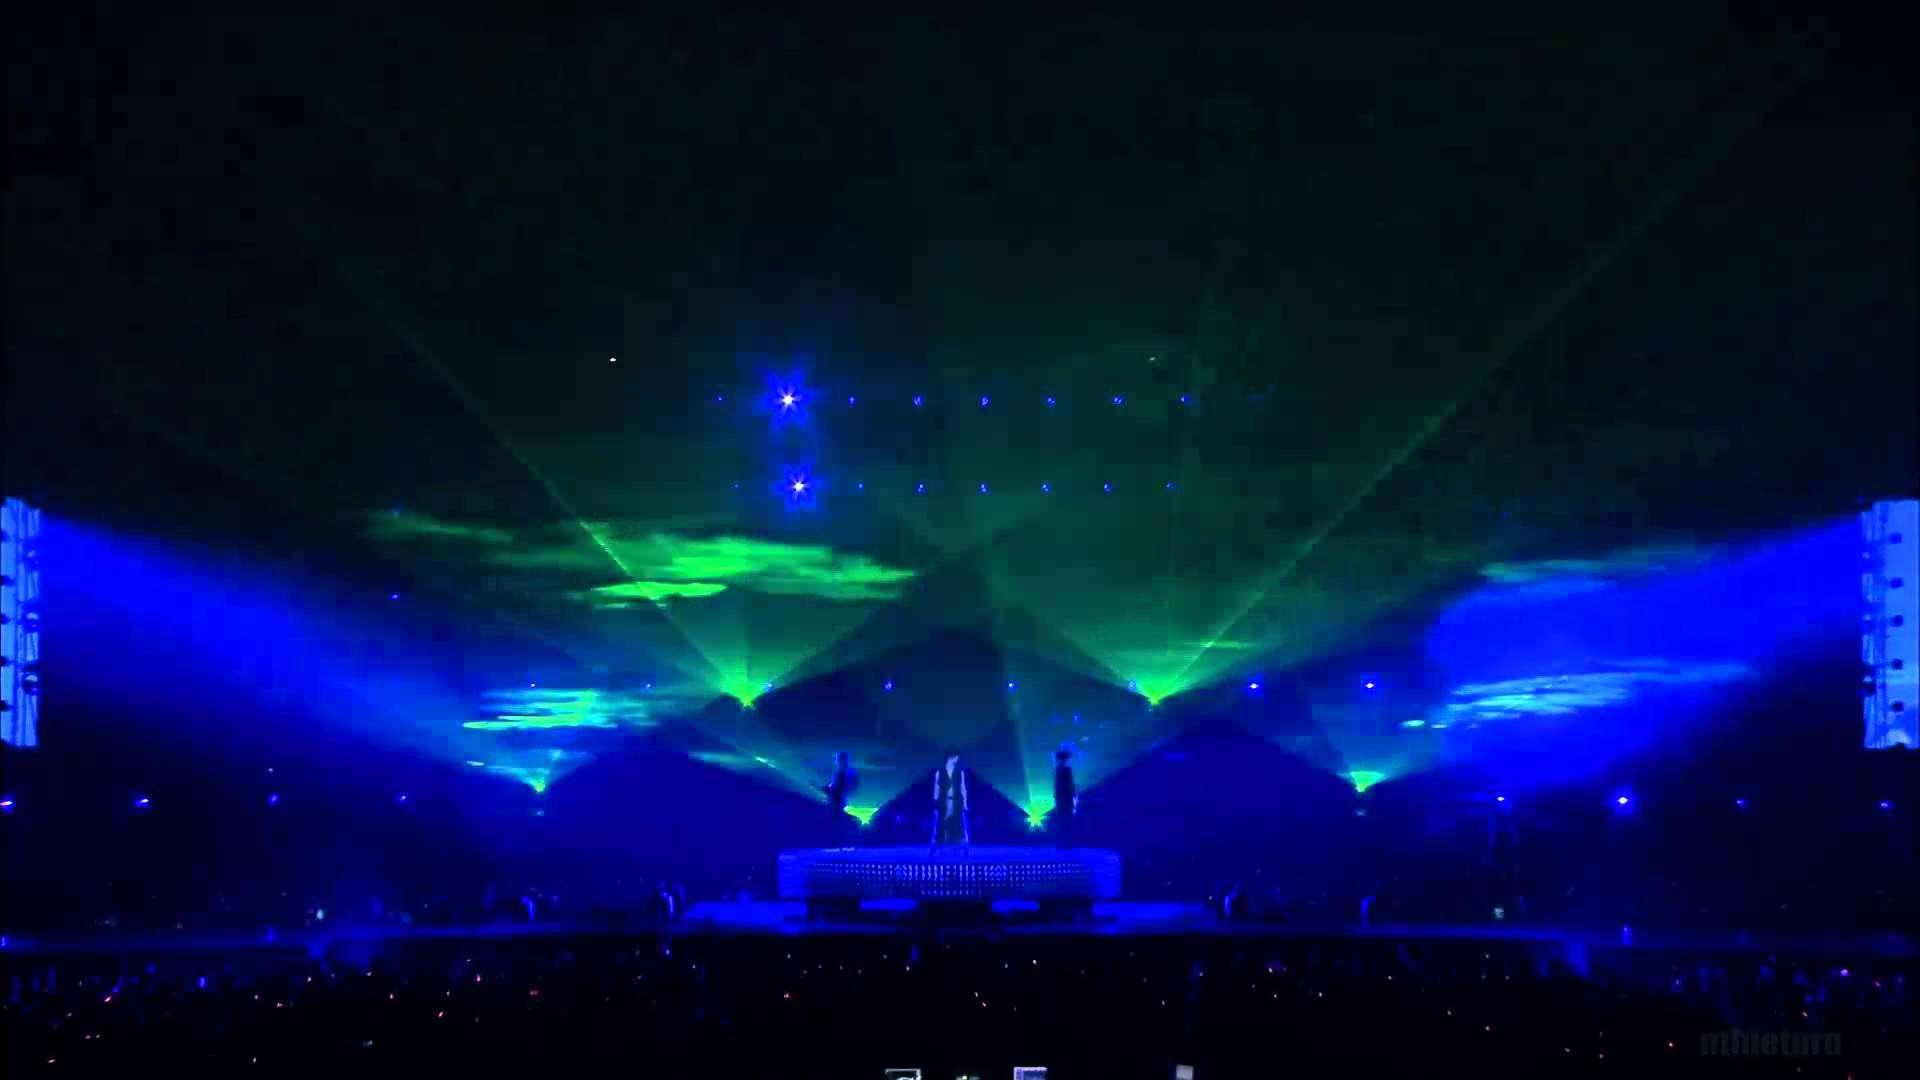 Rusty Nail - Changmin @ TVXQ LIVE TOUR 2012 TONE TOKYO DOME - YouTube